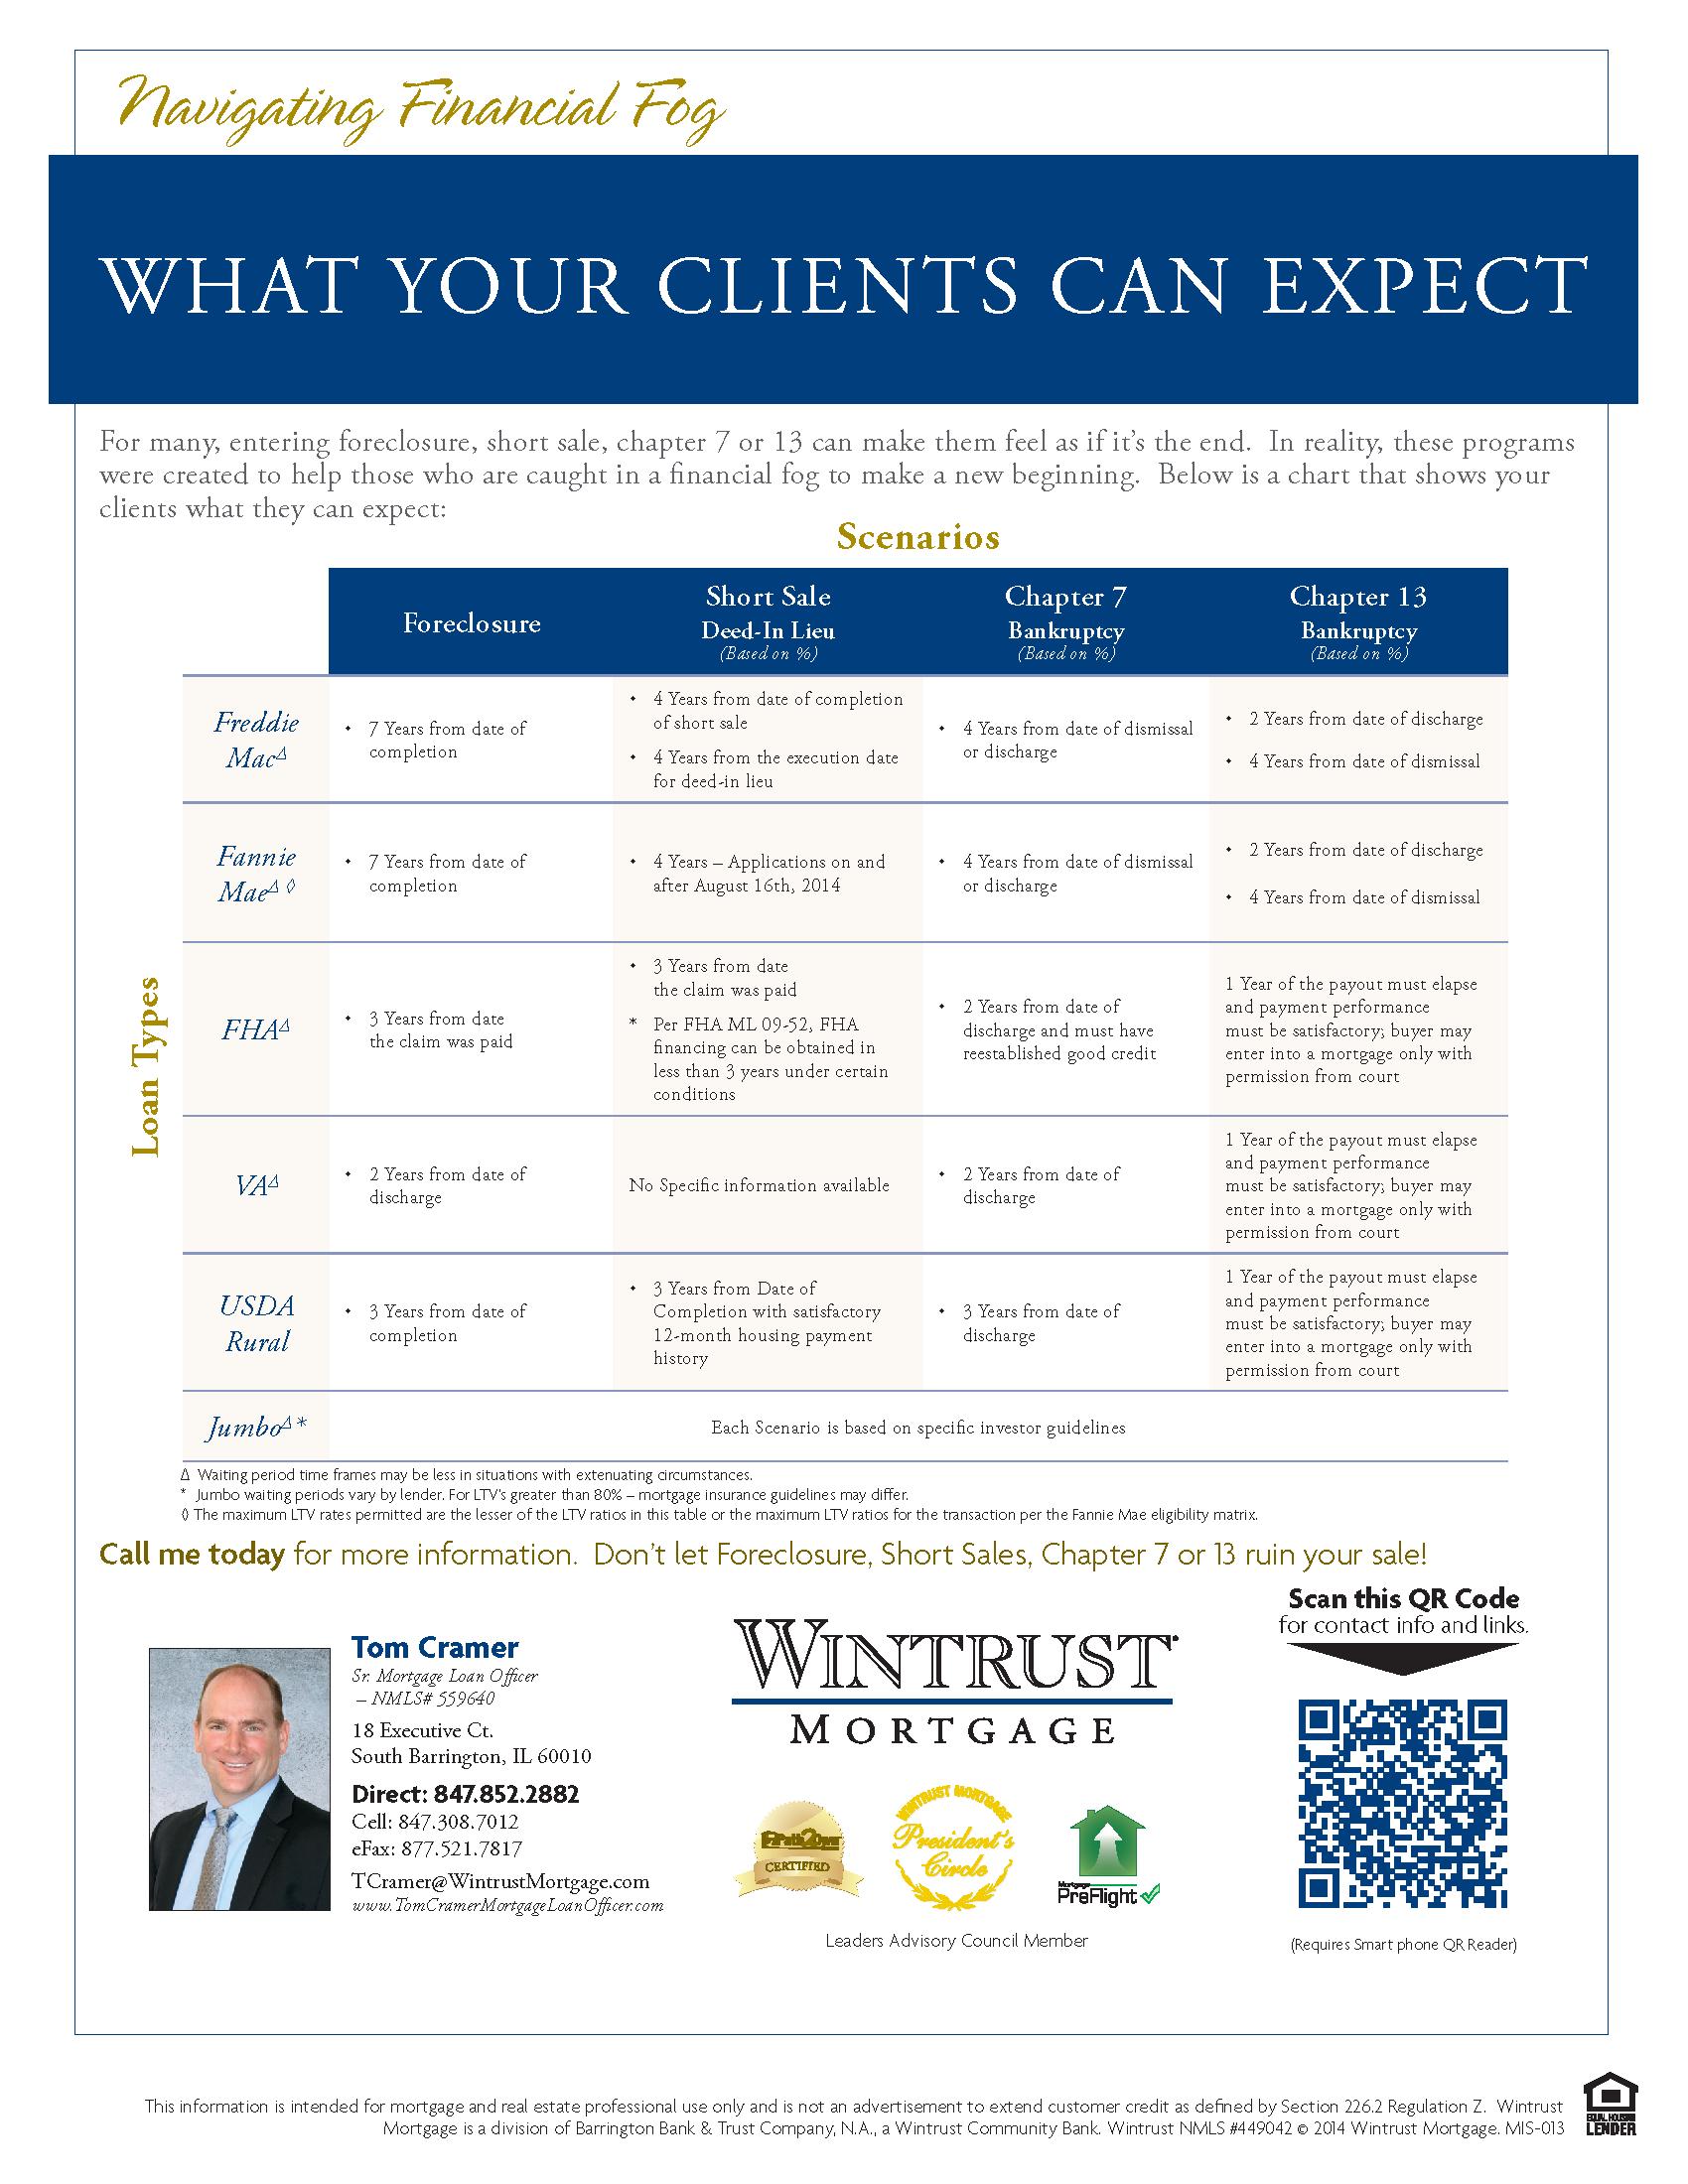 ee494057e503c1012e3c10608dc3903d - How Hard Is It To Get A Mortgage After Bankruptcy